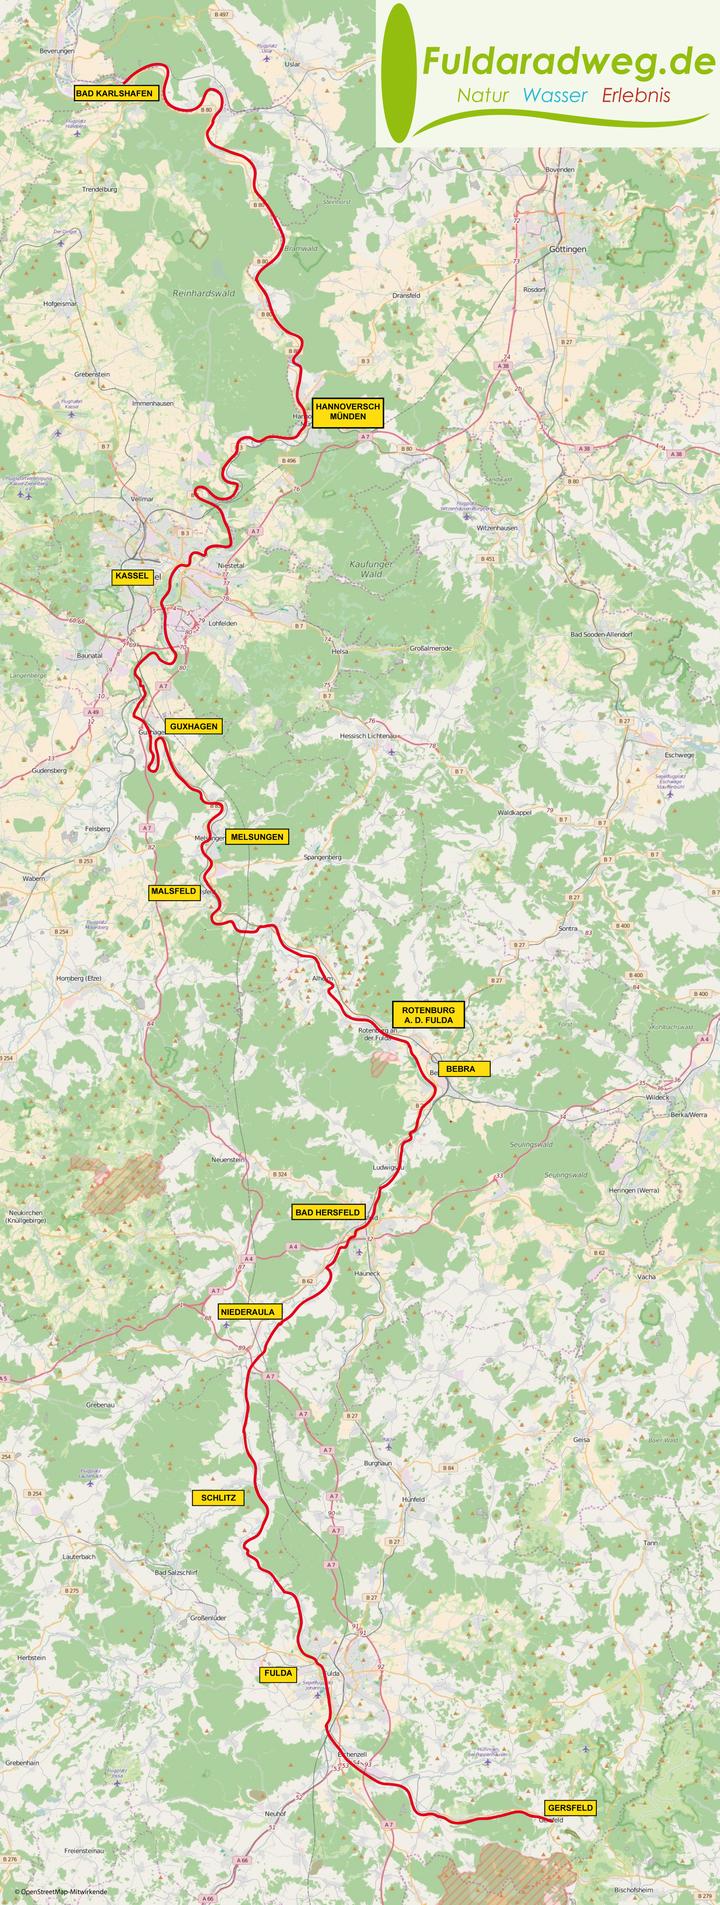 Karte Kassel Und Umgebung.Fuldaradweg Offizielle Website Von Fuldaradweg De